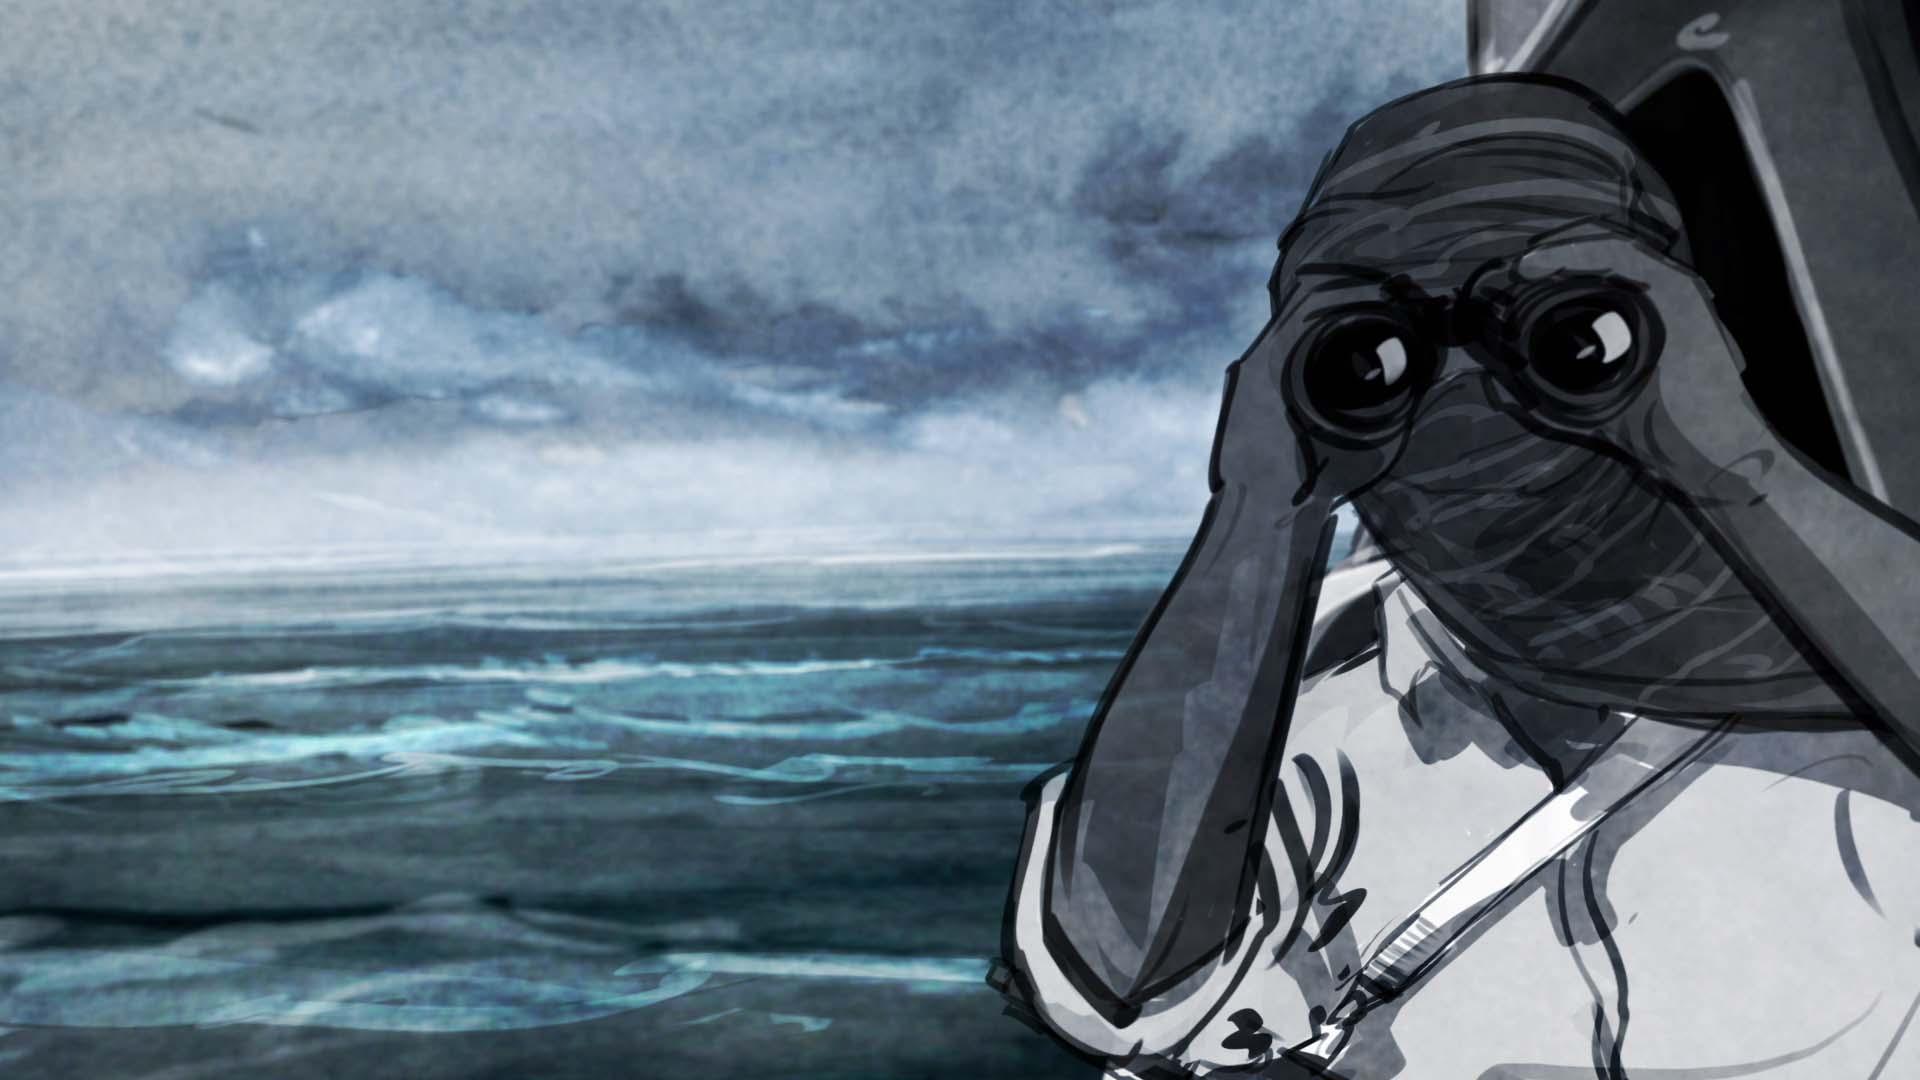 Submarine Channel | About - Submarine Channel